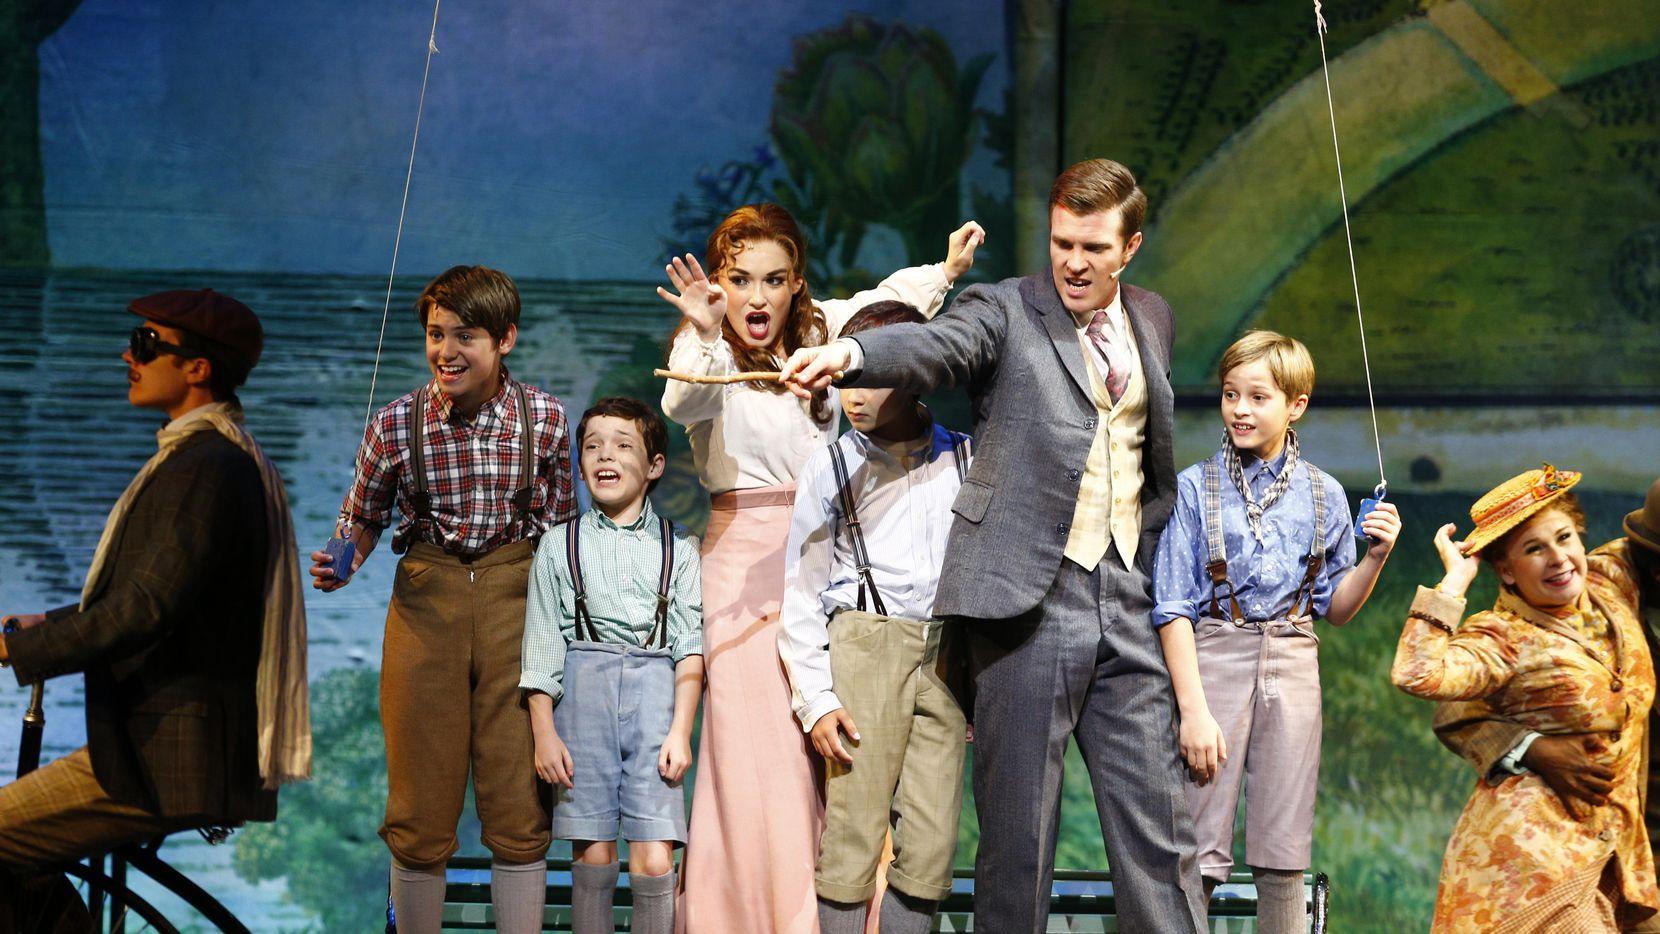 El musical Finding Neverland se presenta desde esta semana en el Winspear Opera House. Foto DMN